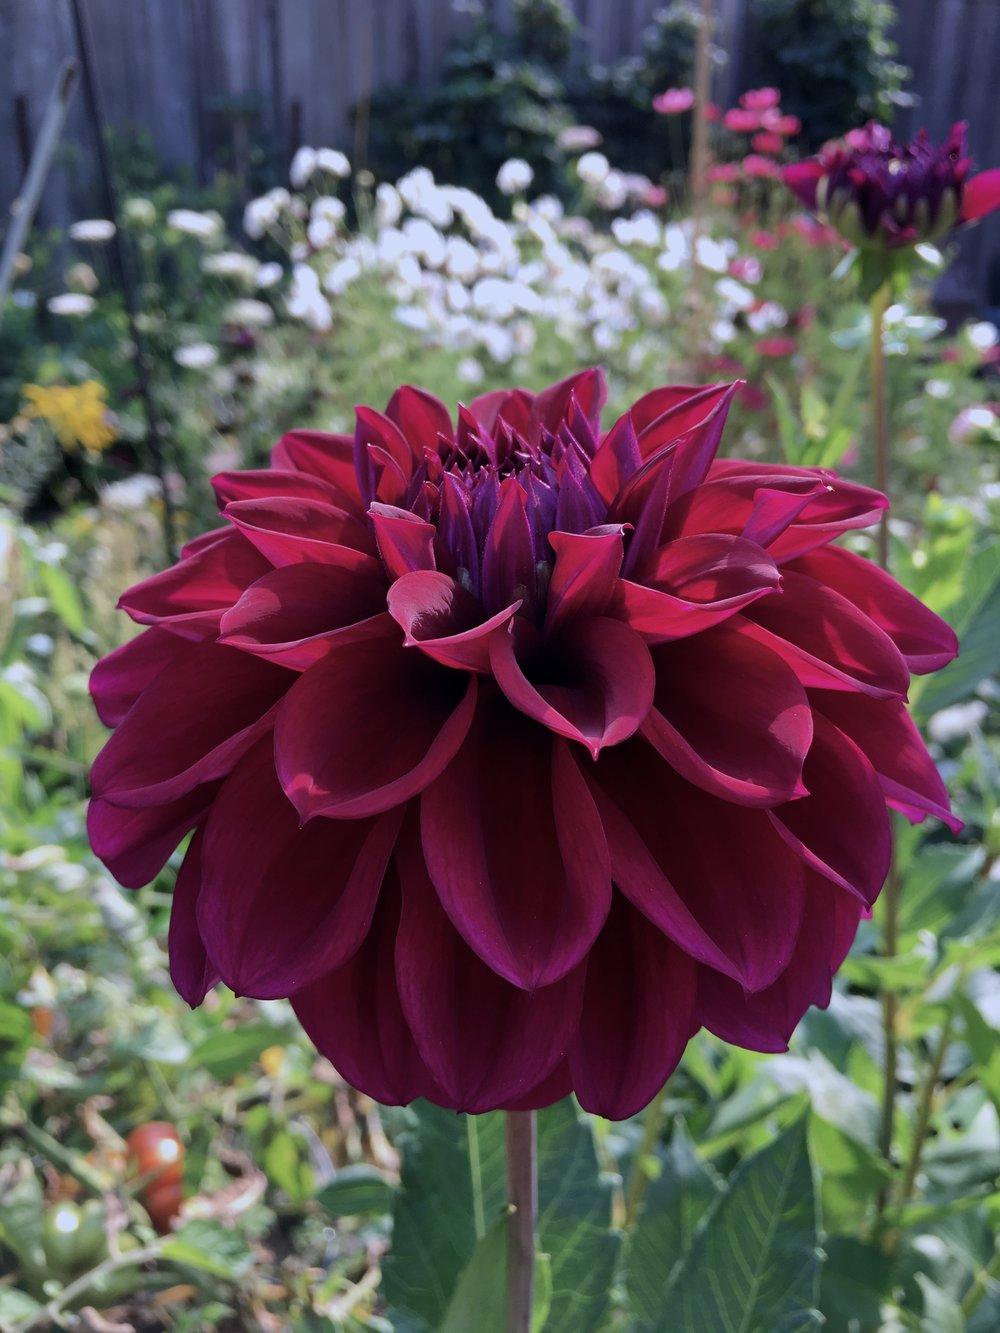 Diva - Diva : Deep eggplant purple blooms with beautiful form, 4-6